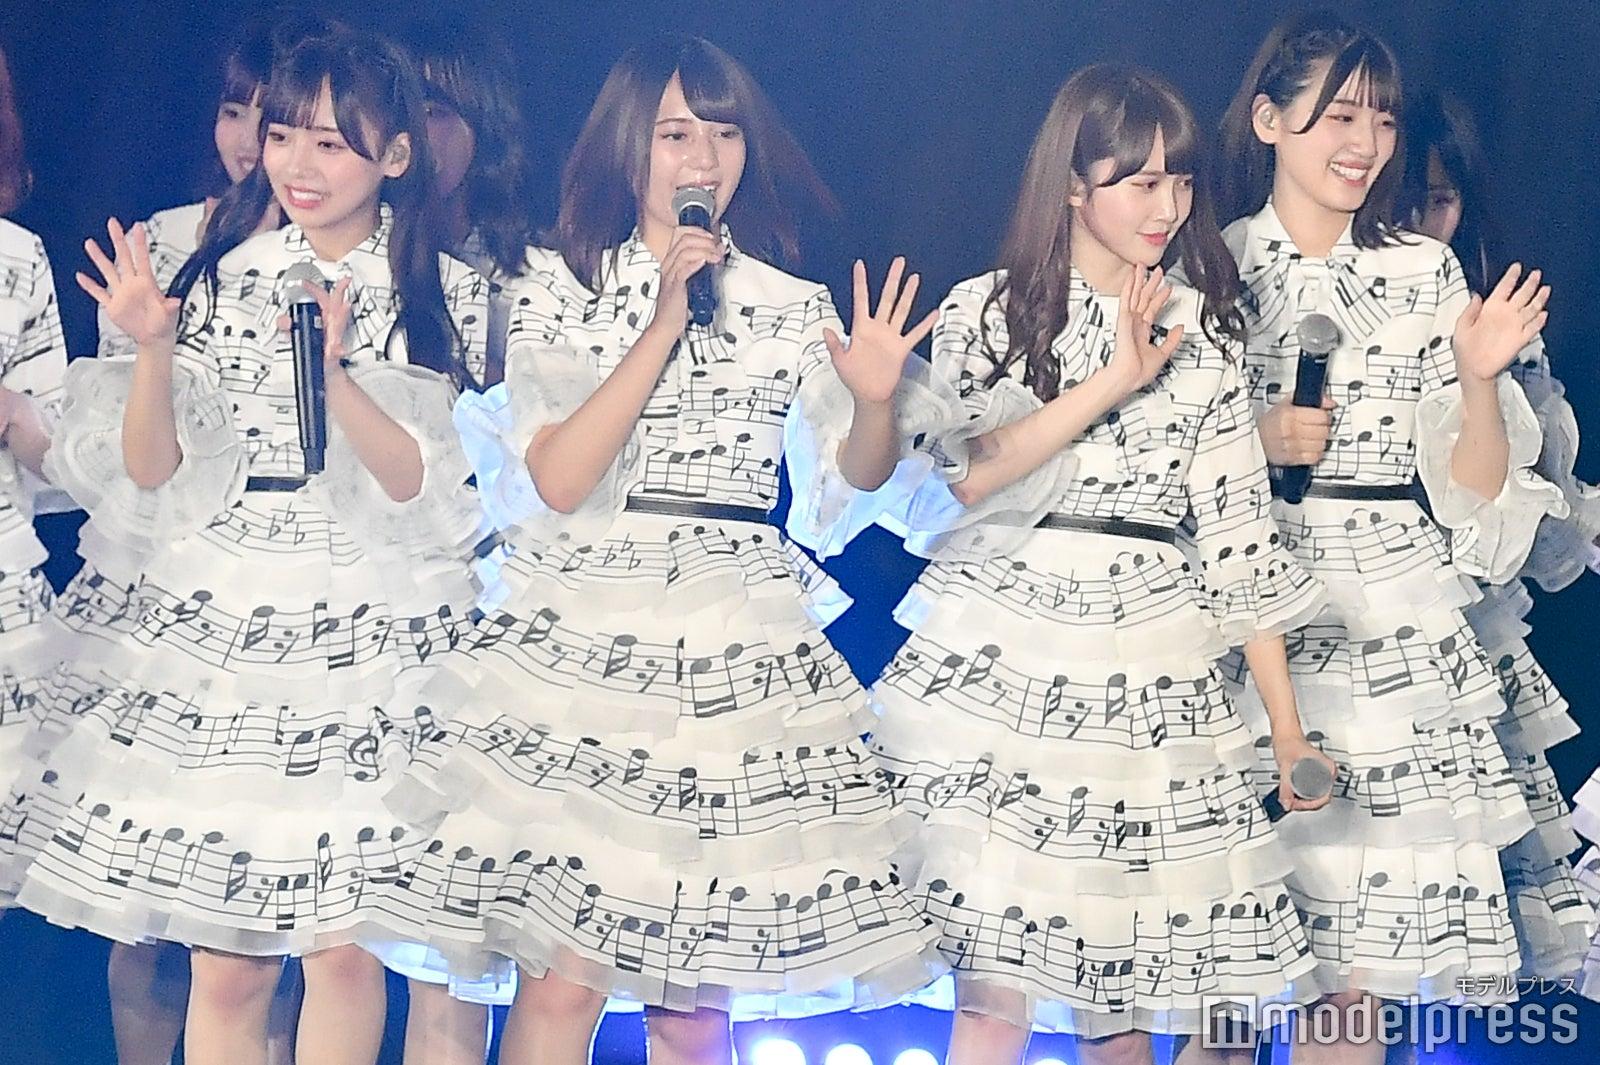 日向坂46、2年連続ライブ出演 北九州で1万人熱狂<TGC北九州2019